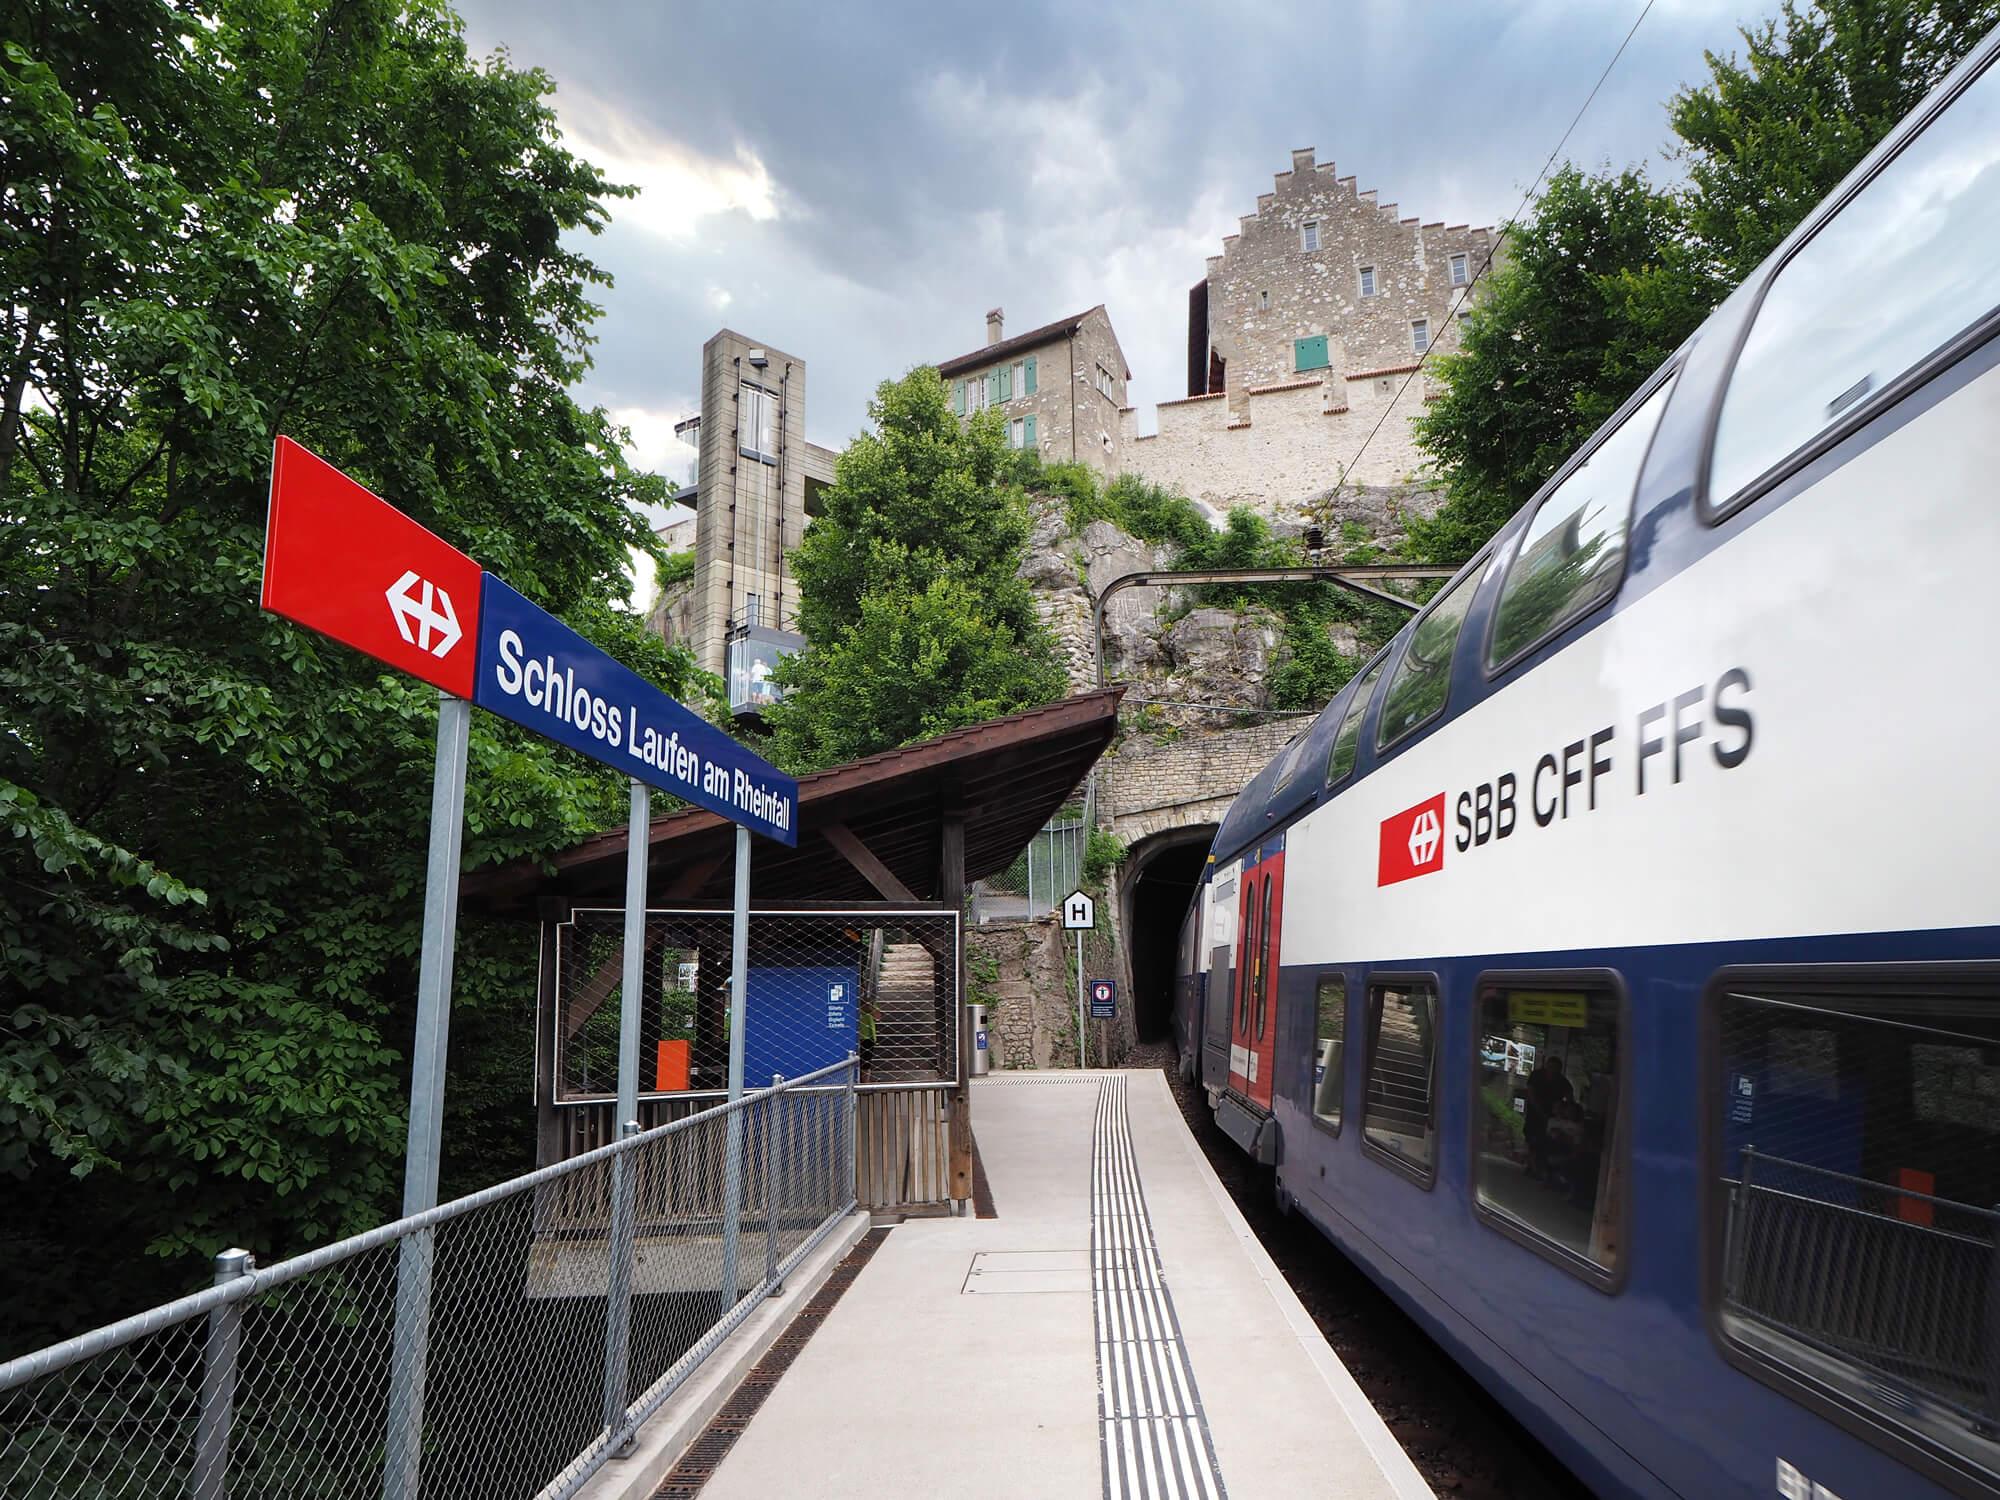 Train Station at Rhine Falls in Neuhausen